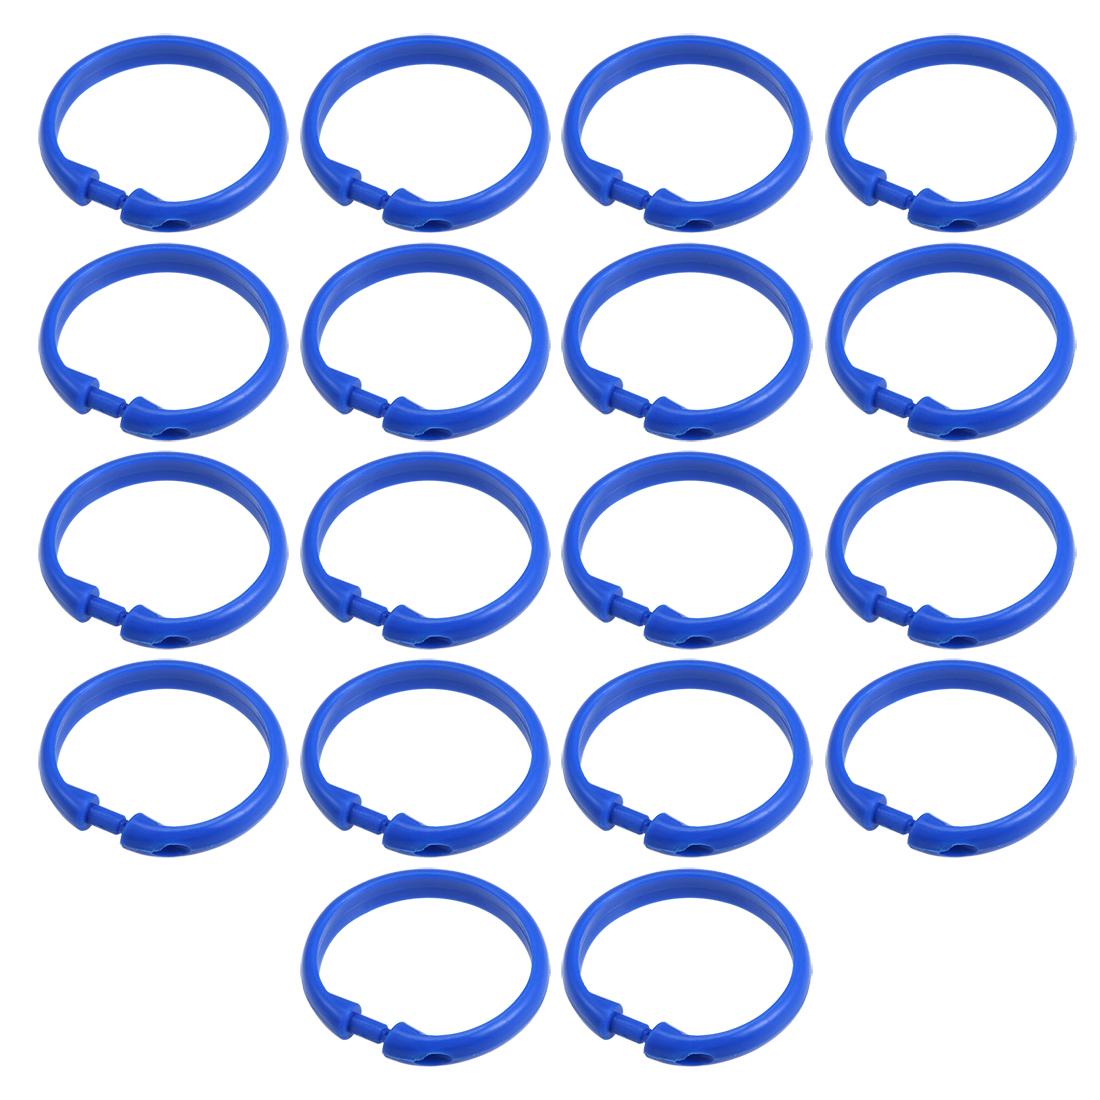 Curtain Rings Plastic O Shape Snap for Curtain Rod Blue 50mm Inner Dia 18 Pcs